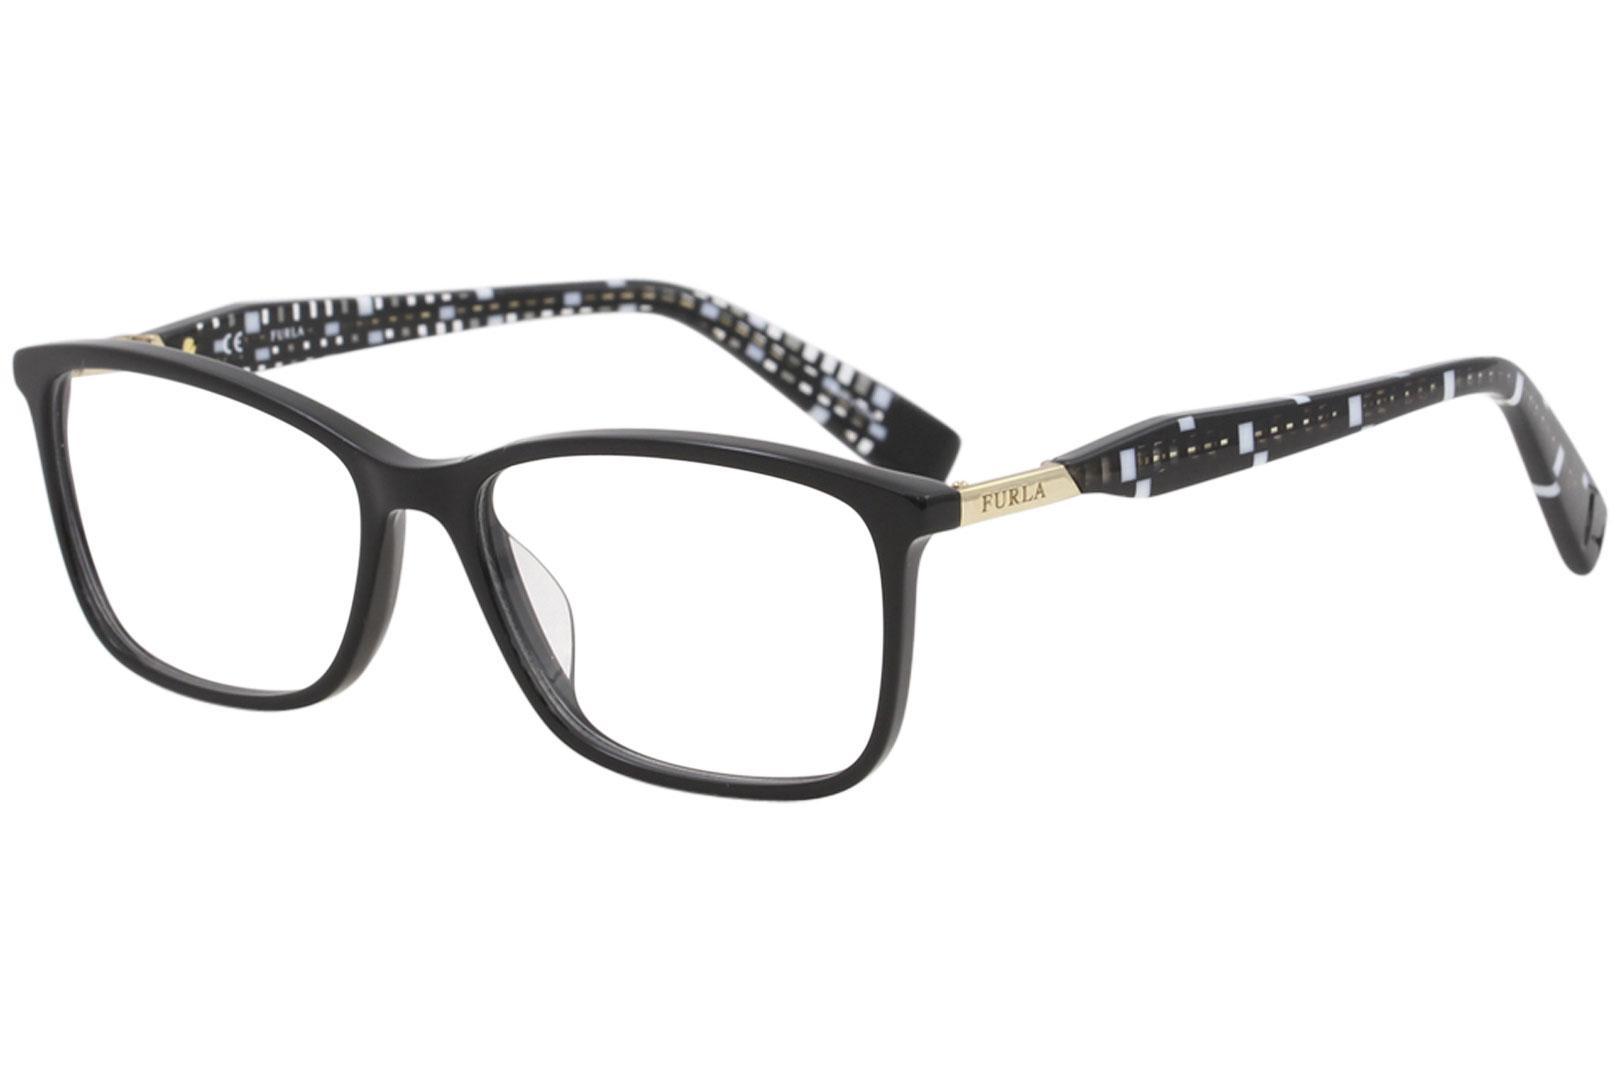 94d2964717a Furla Women s Eyeglasses VFU028 VFU 028 Full Rim Optical Frame